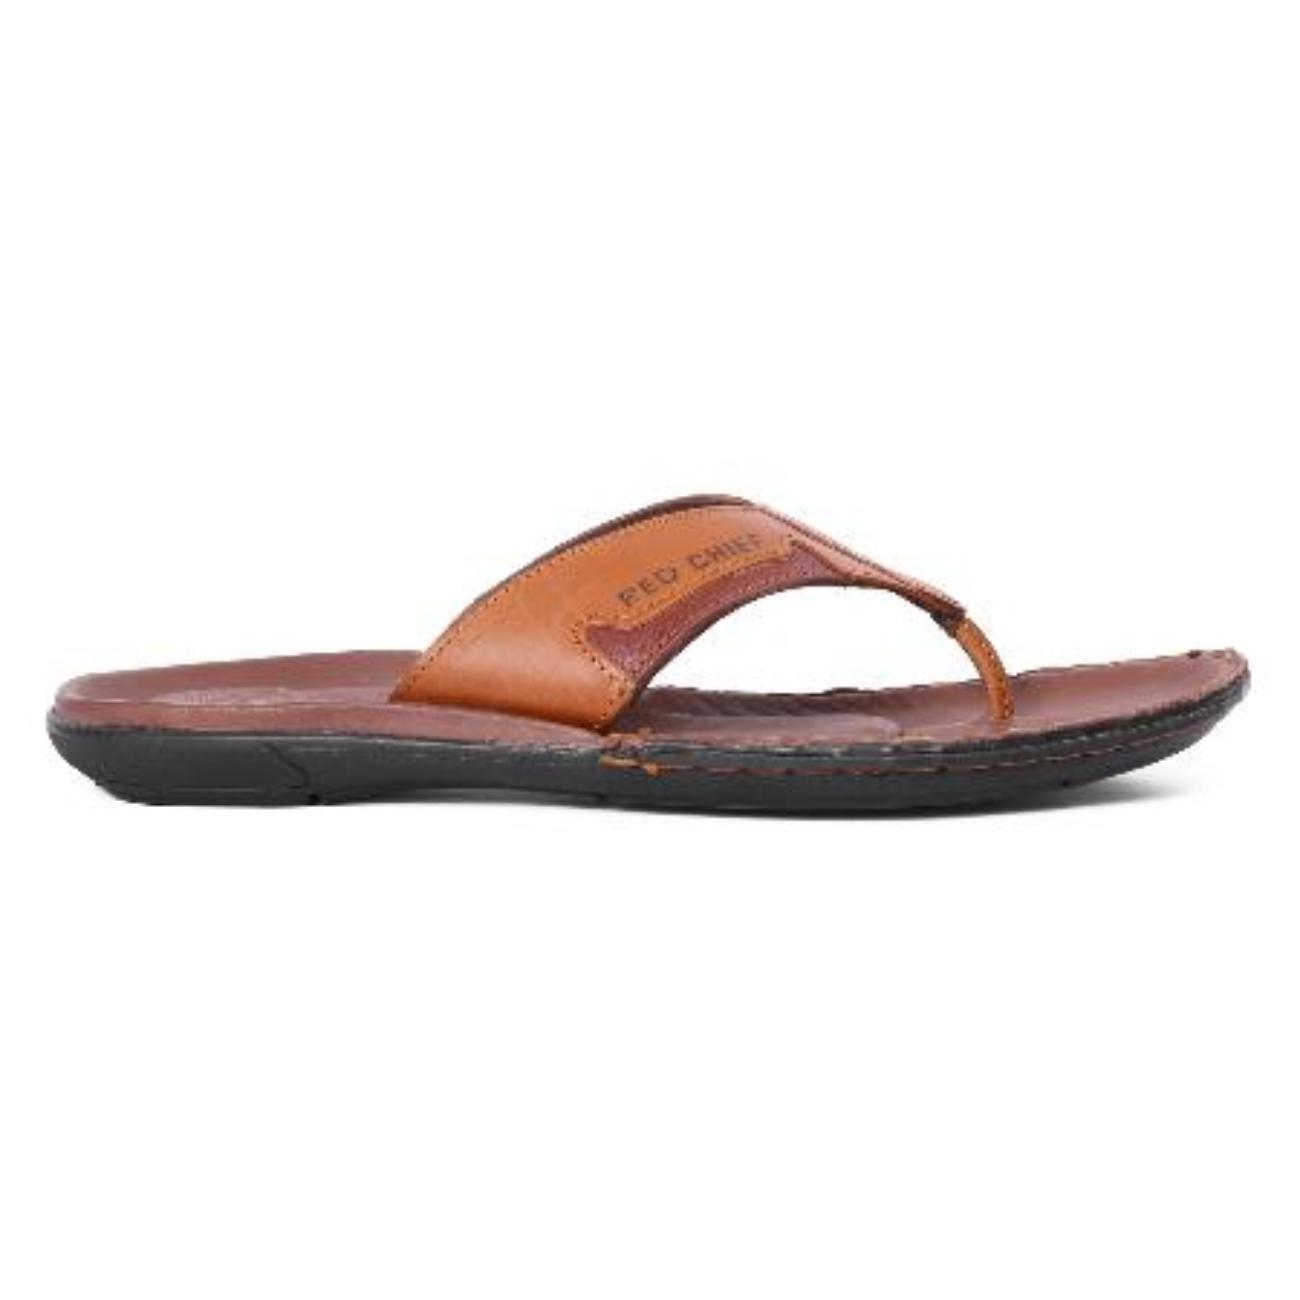 buy tan slip-on slippers side view_1